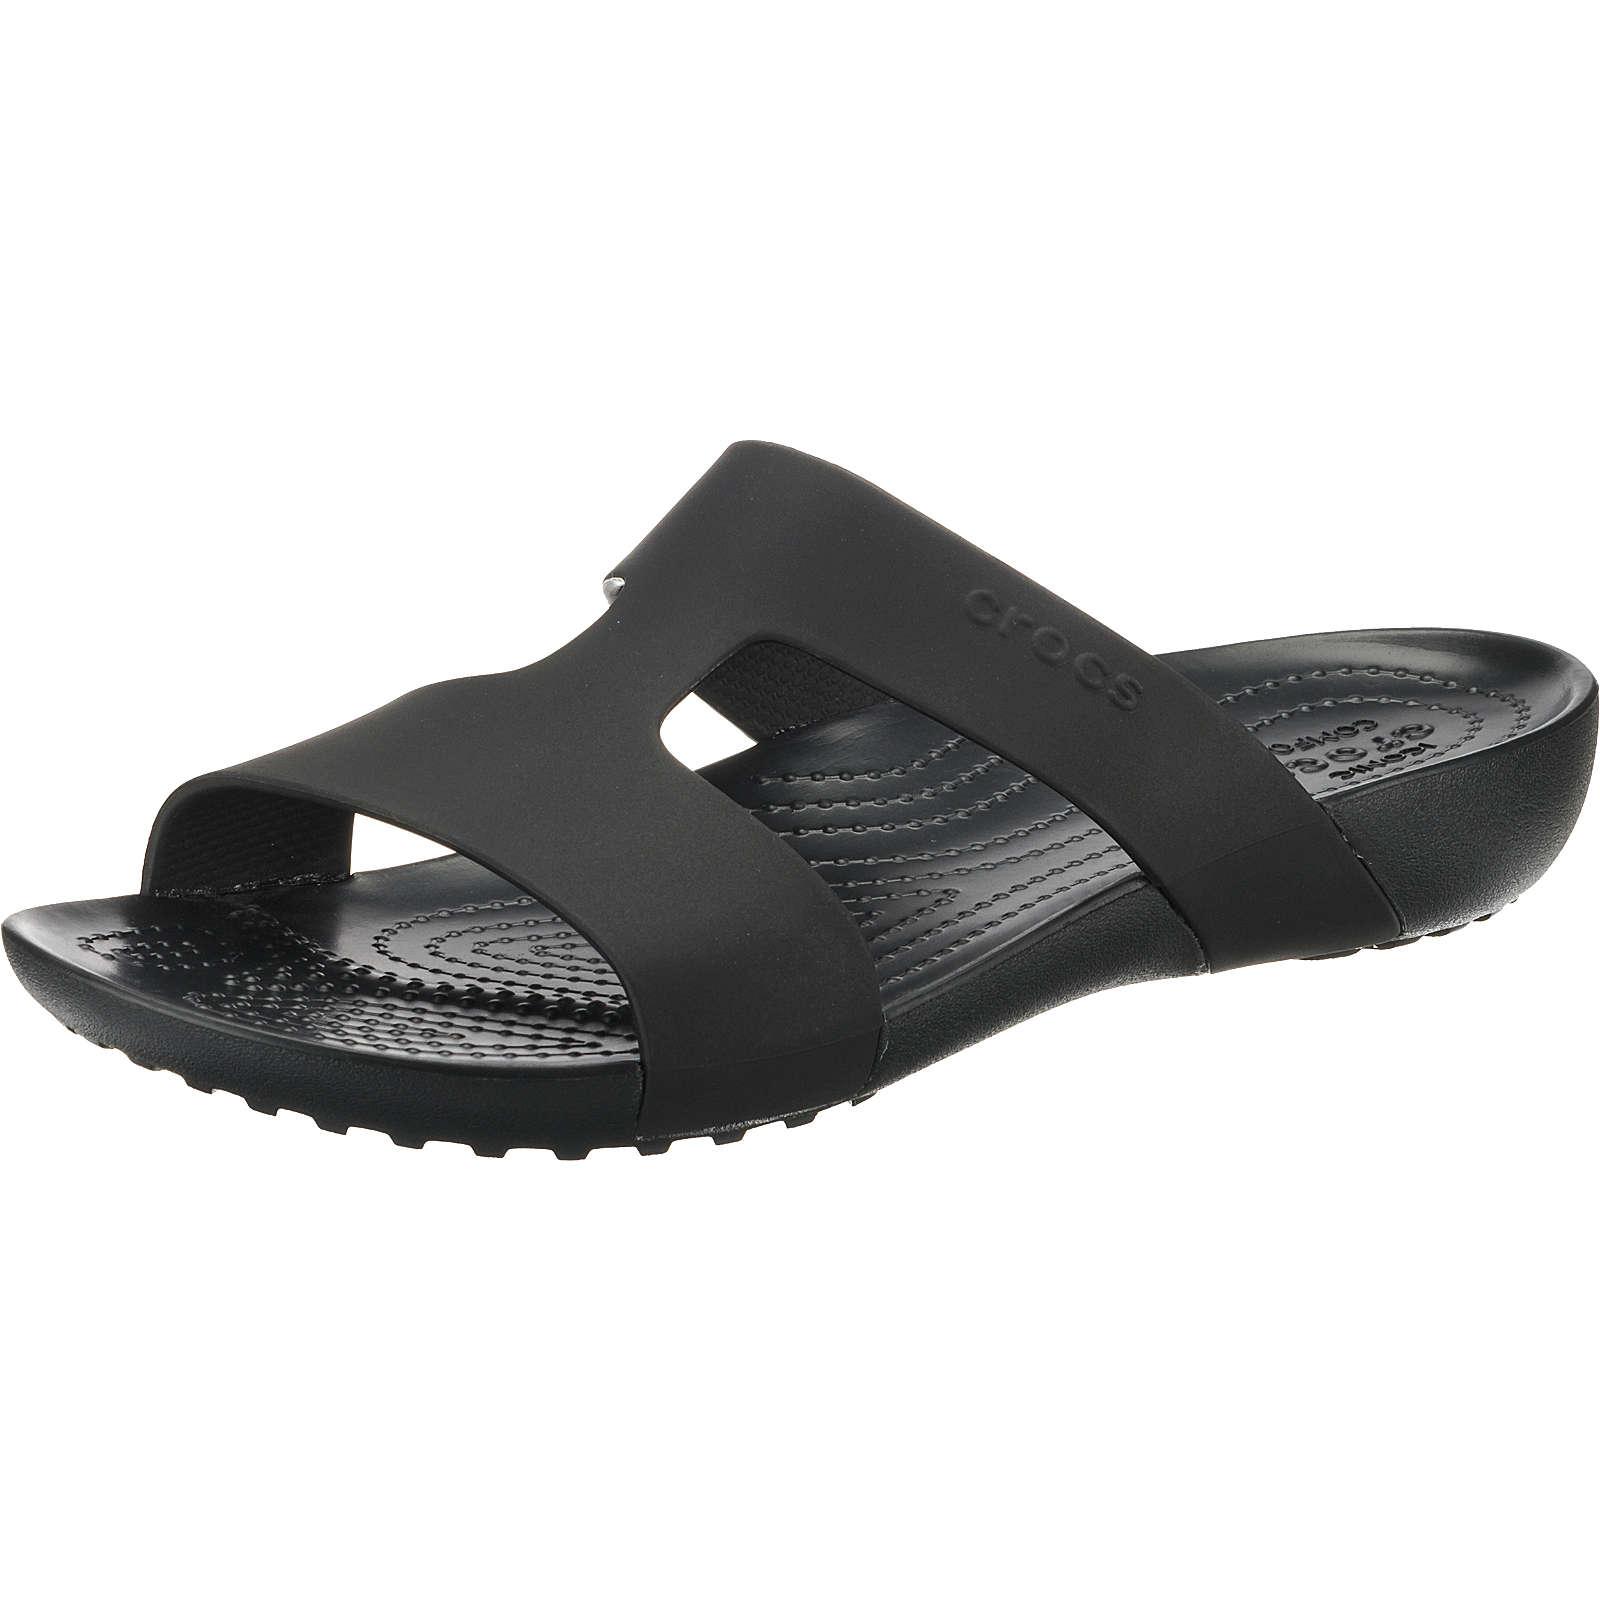 Crocs Serena Slide W Blk/Blk Komfort-Pantoletten schwarz Damen Gr. 36/37